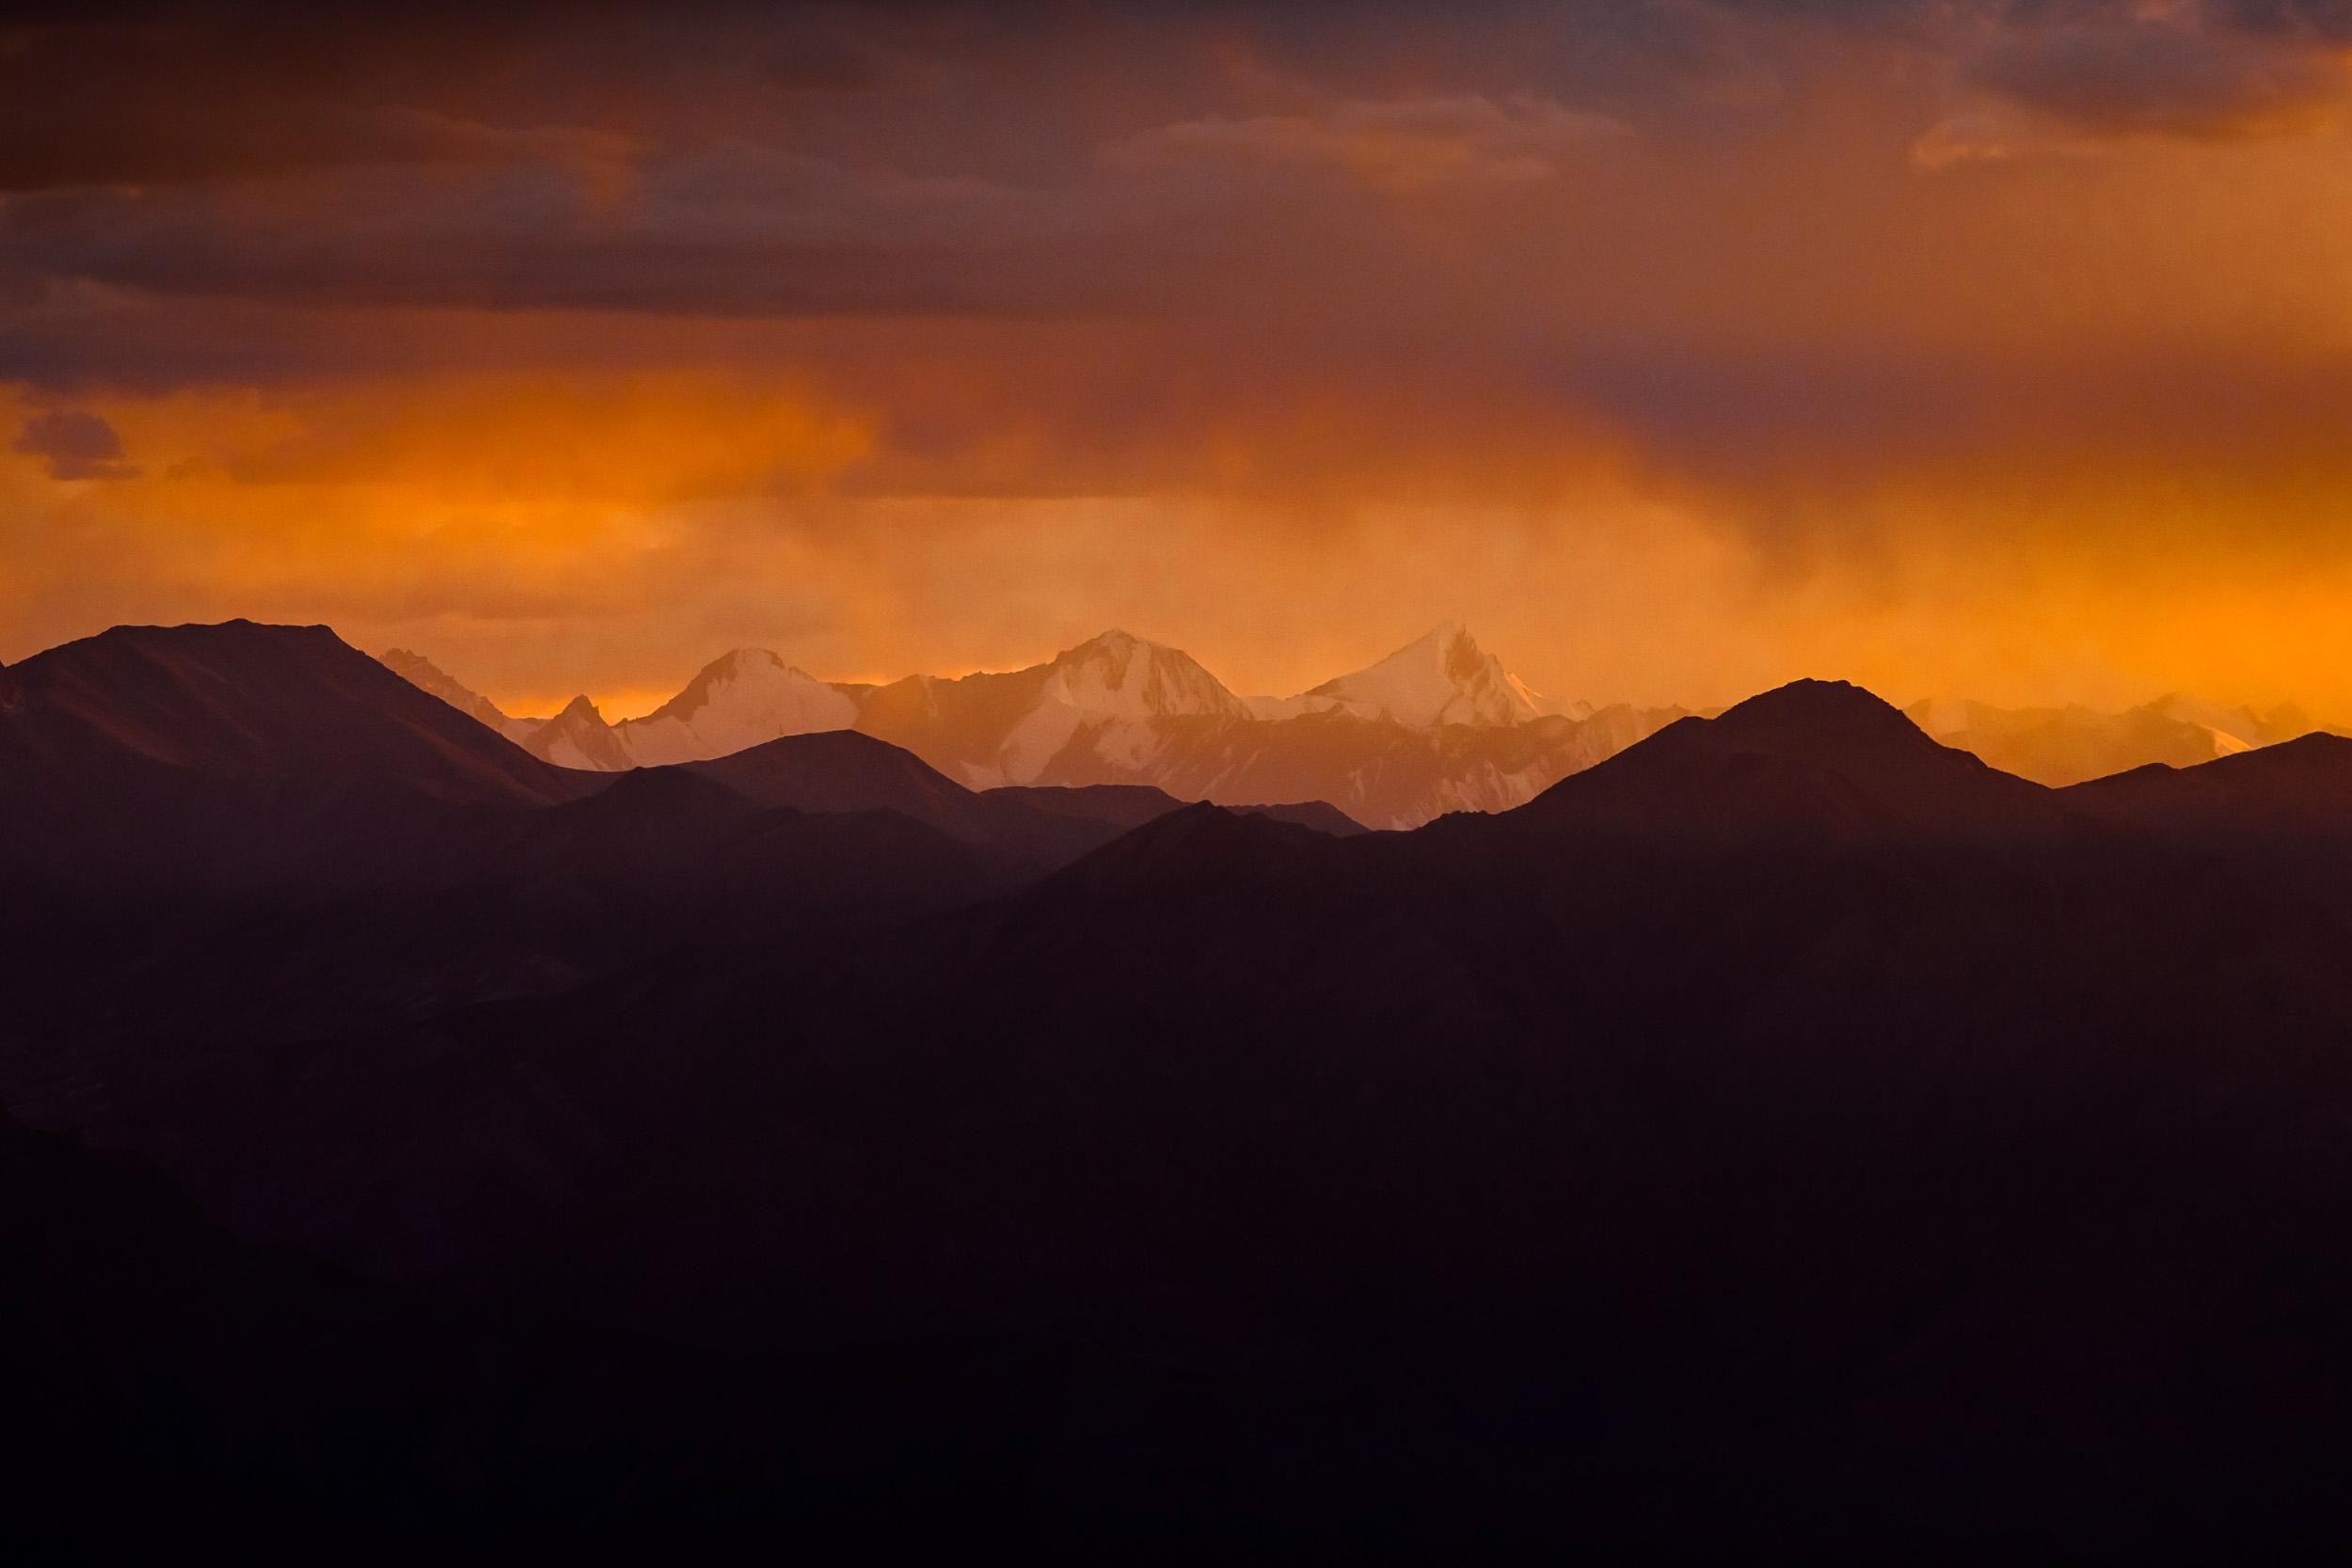 Sindhur_Photography_Travel_Landscape_Ladakh-13.JPG